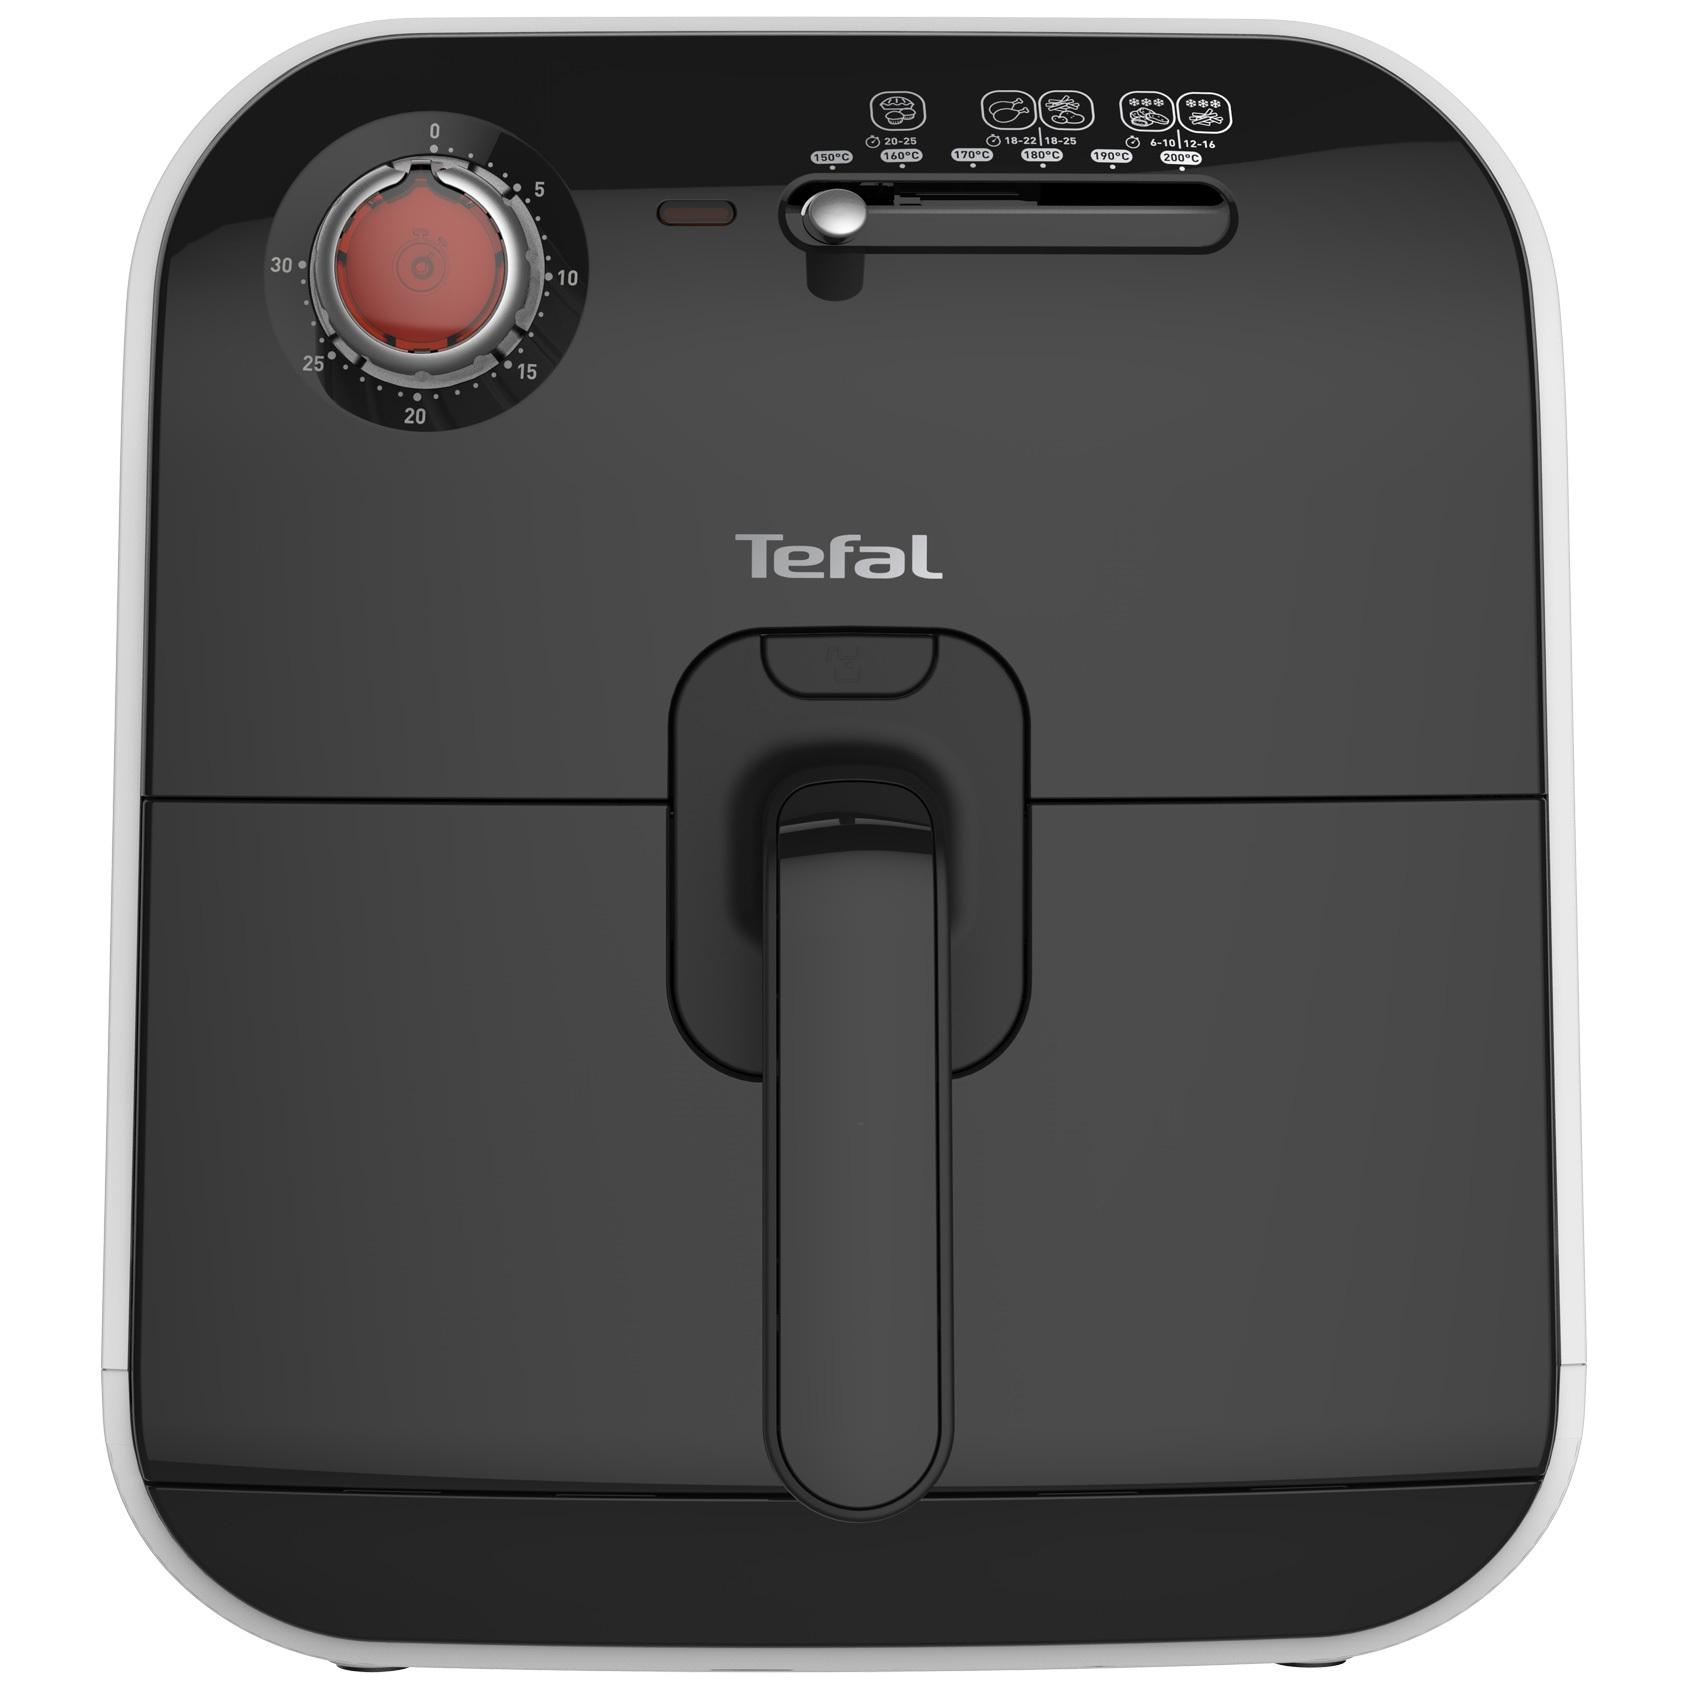 TEFAL AIR FRYER FX100028